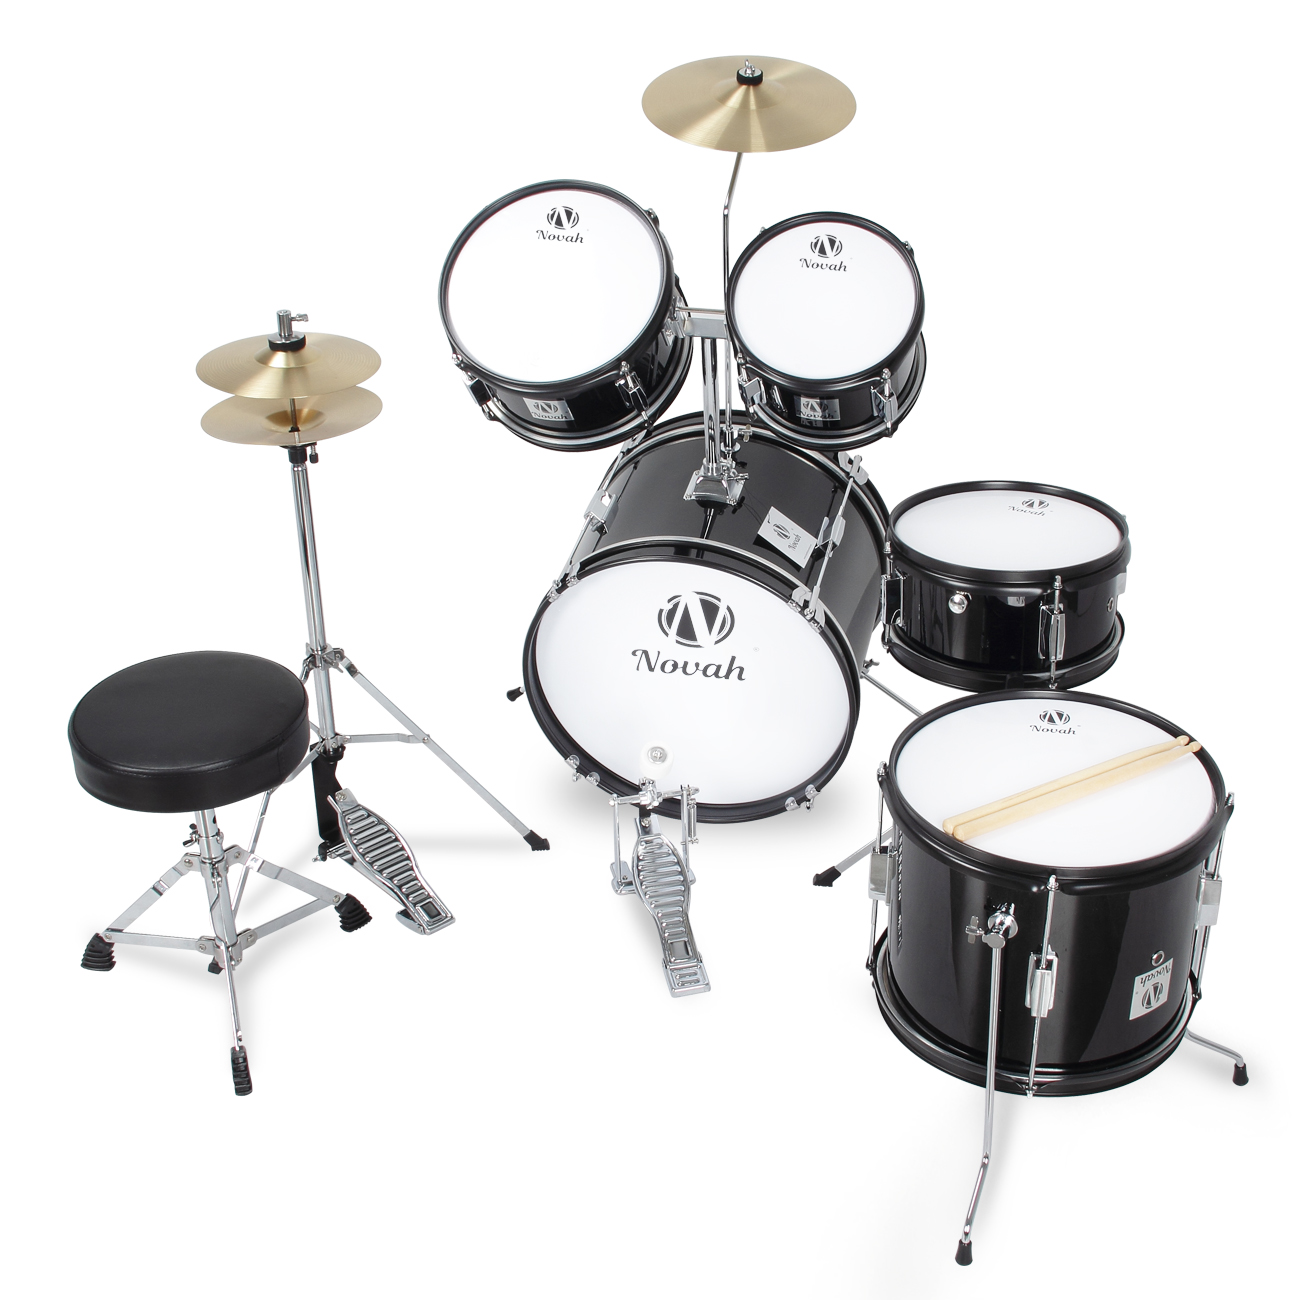 drum set 5 piece complete junior set cymbals full size w stool blue black ebay. Black Bedroom Furniture Sets. Home Design Ideas